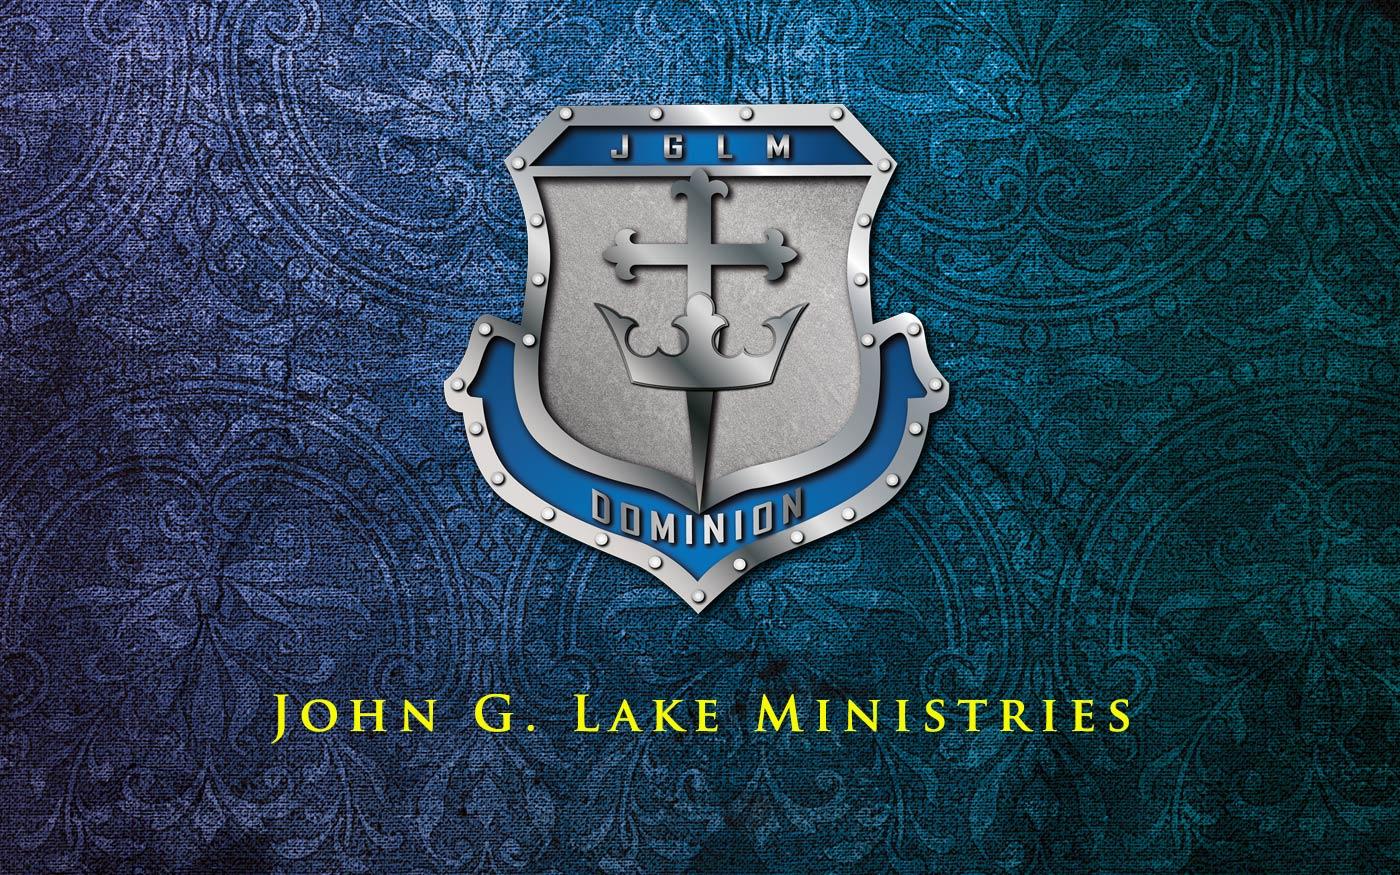 John G. Lake Ministries - JGLM